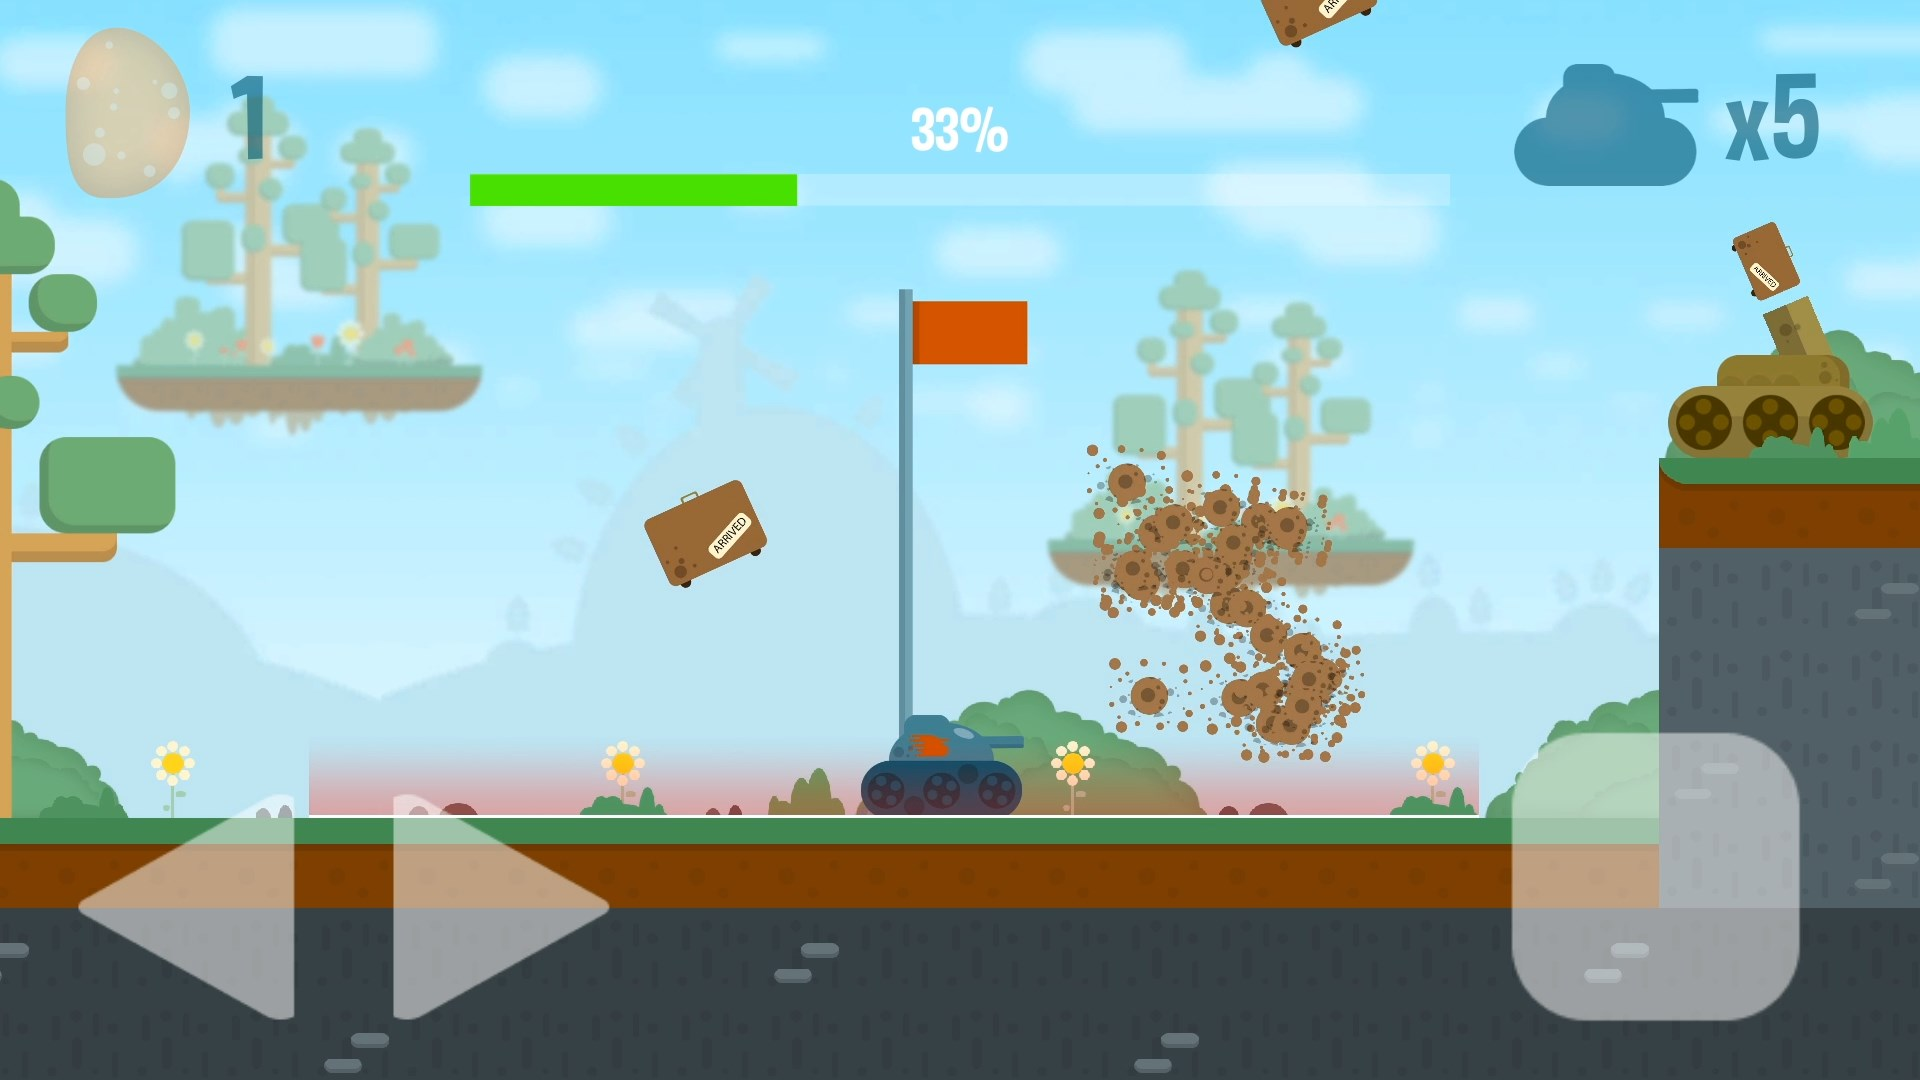 Potatoes Tank скриншоты | Potatoes Tank - хадкорный платформер